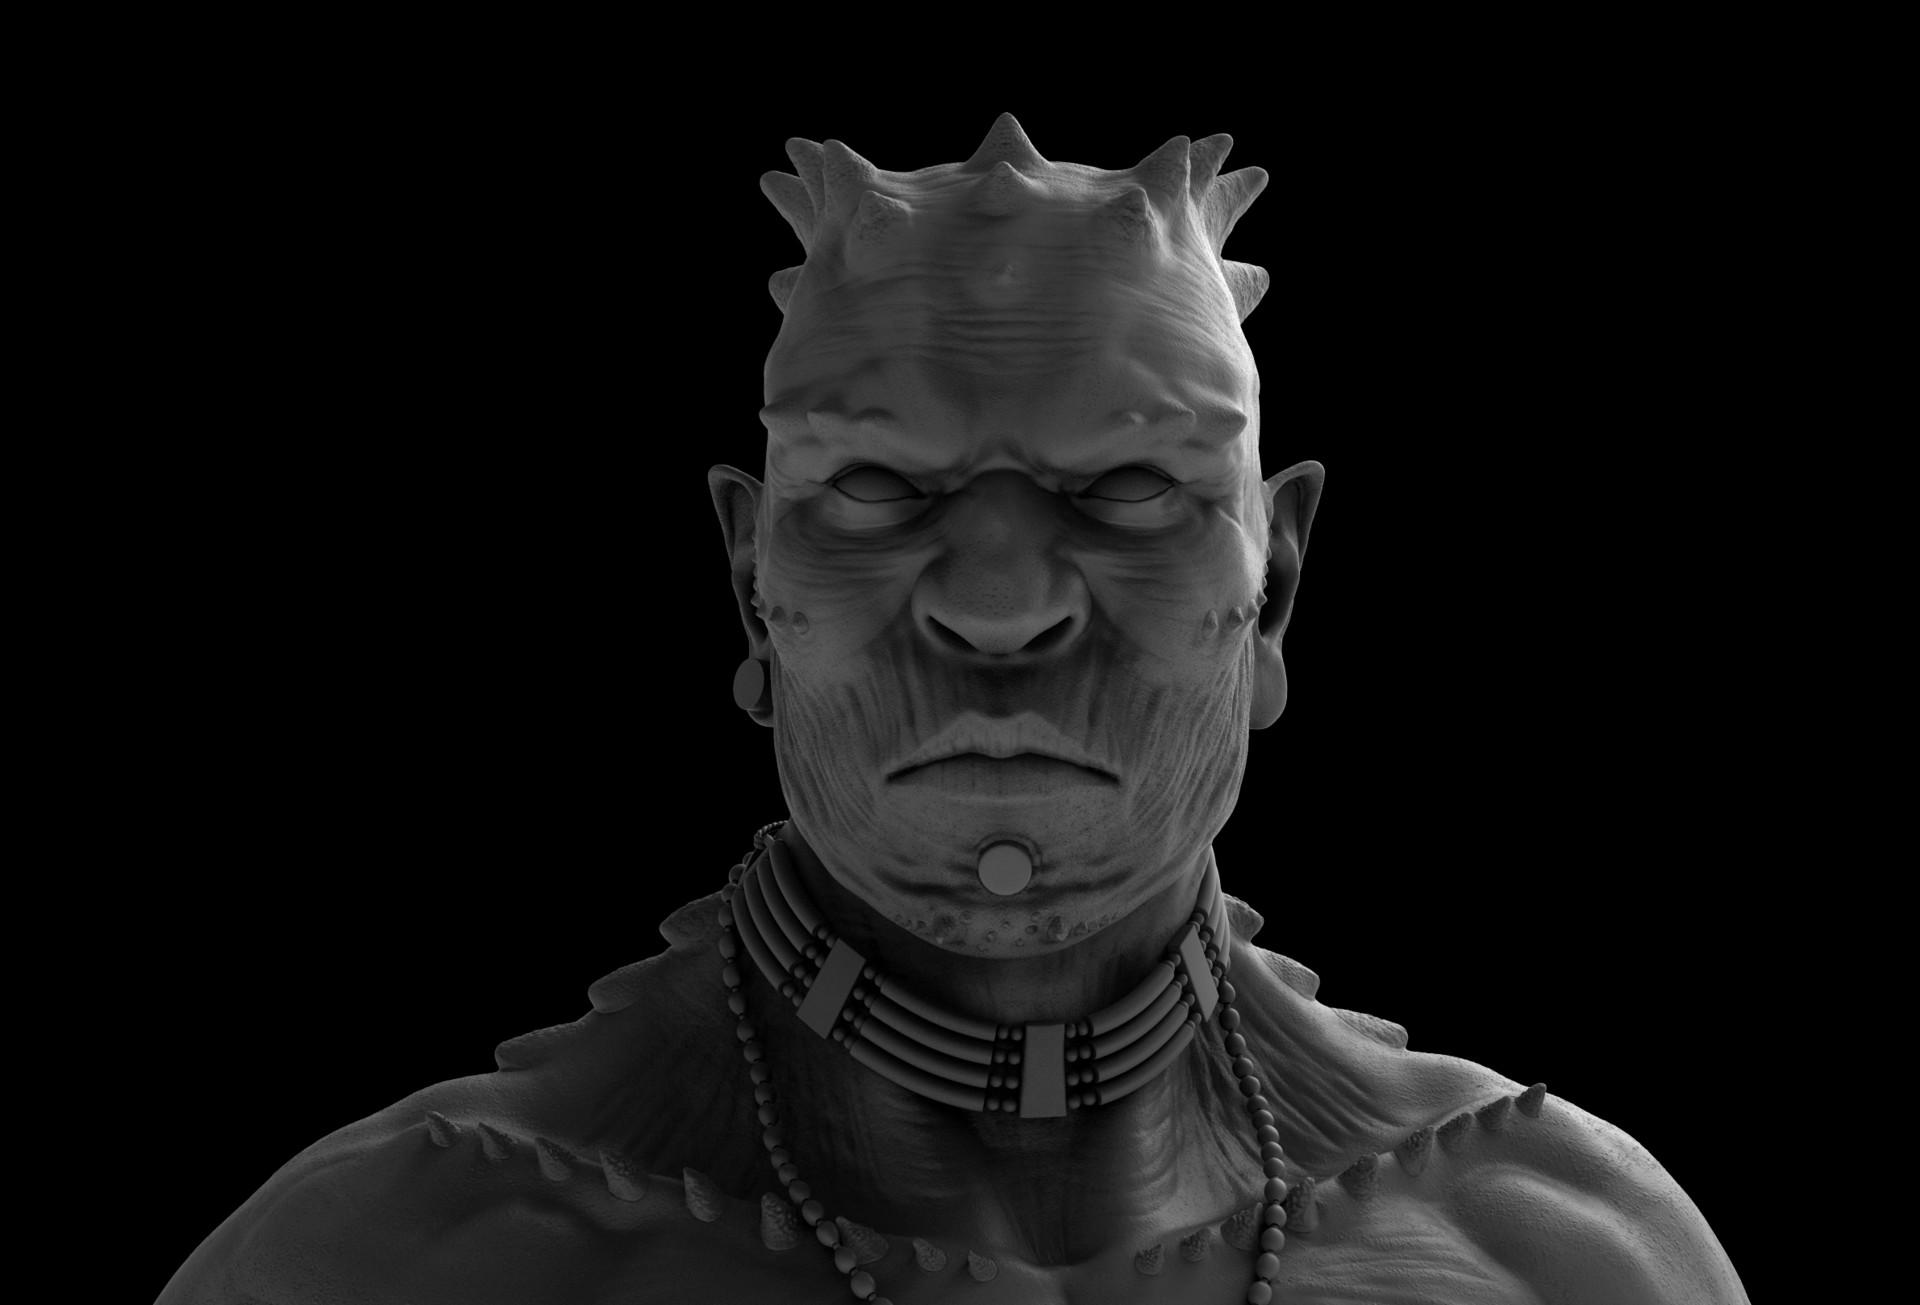 Face, clay